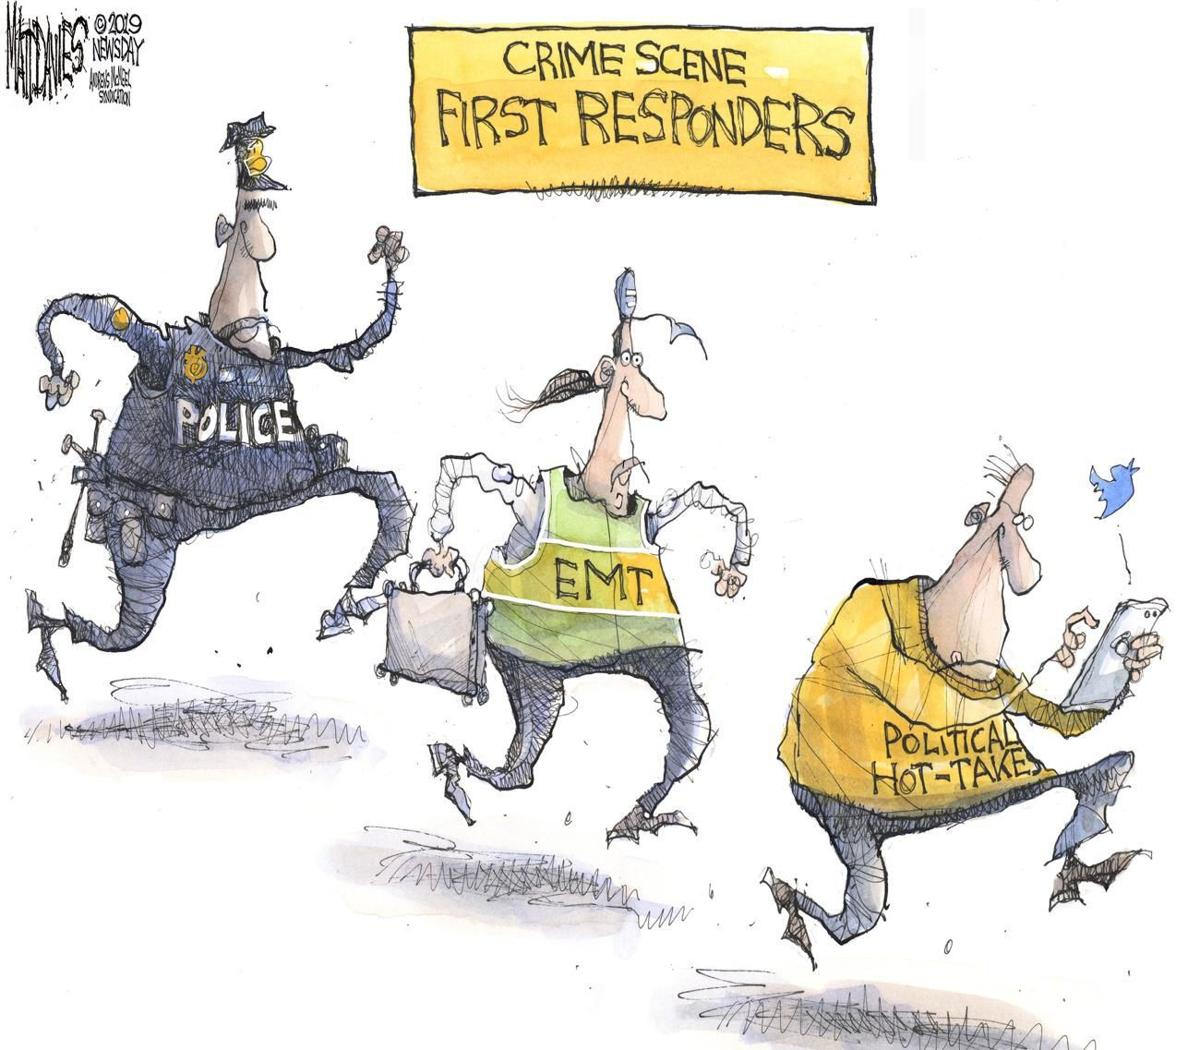 Cartoon: First responders